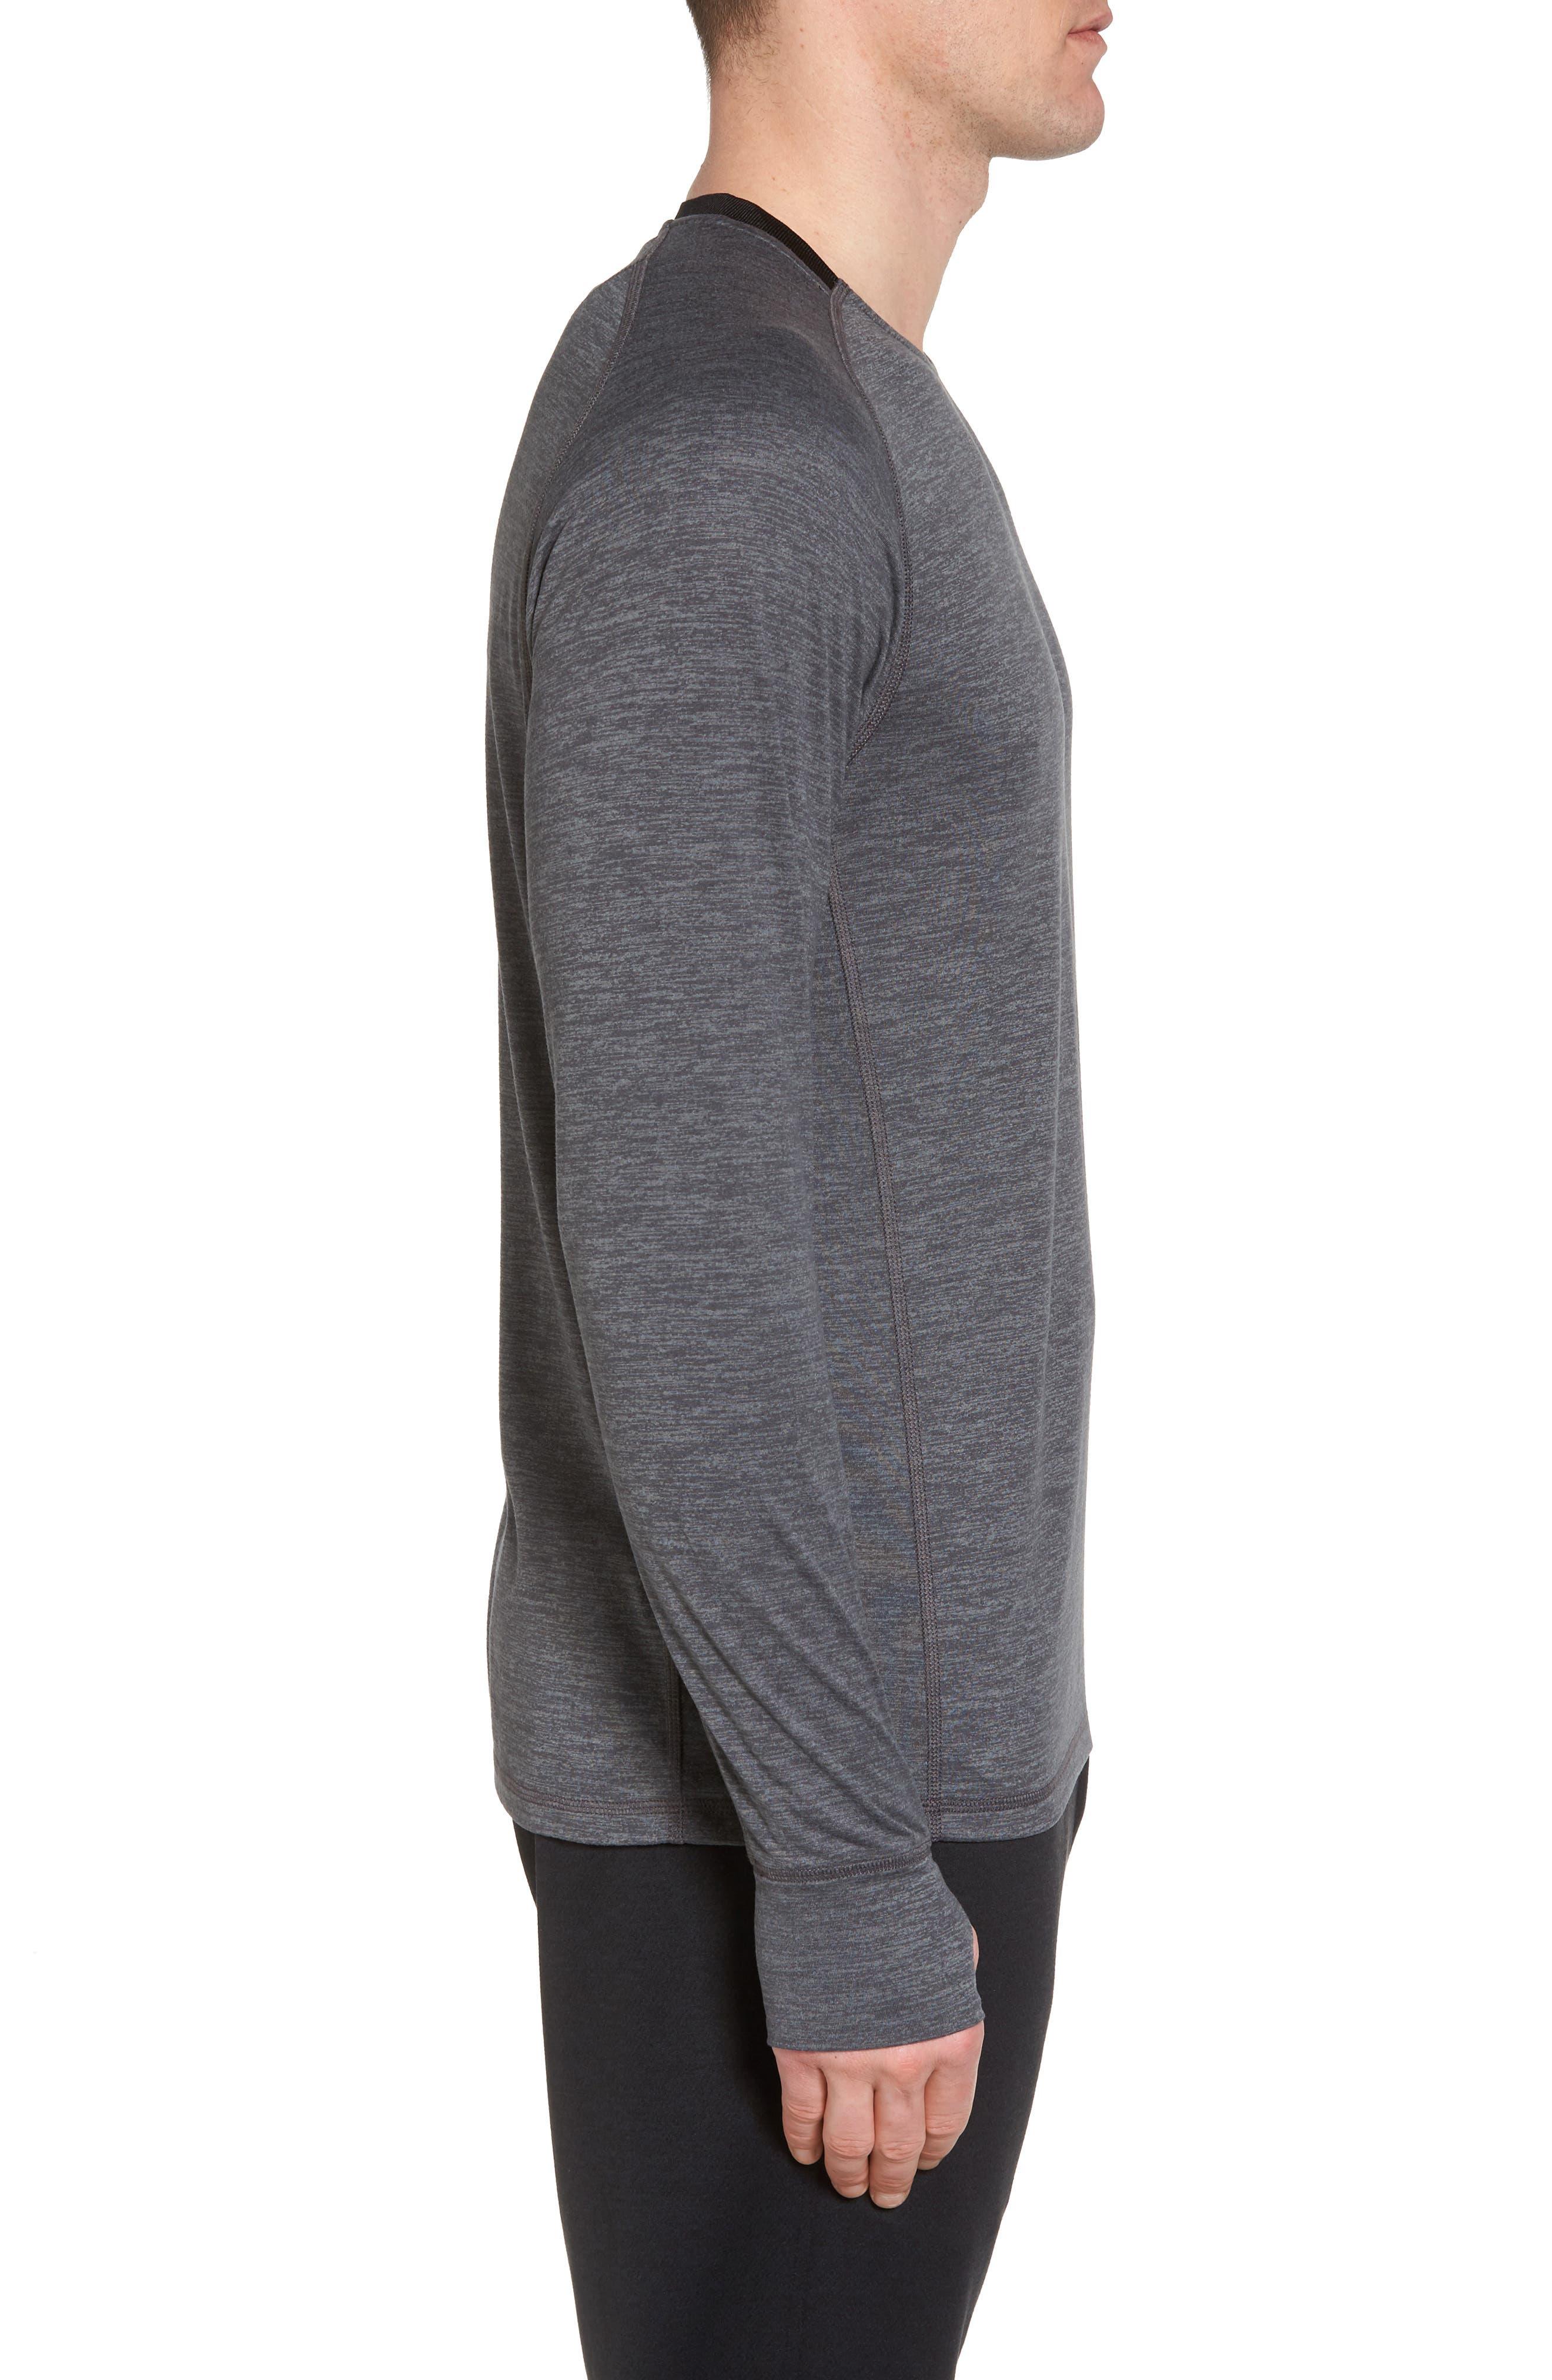 Larosite Athletic Fit T-Shirt,                             Alternate thumbnail 3, color,                             GREY EBONY MELANGE